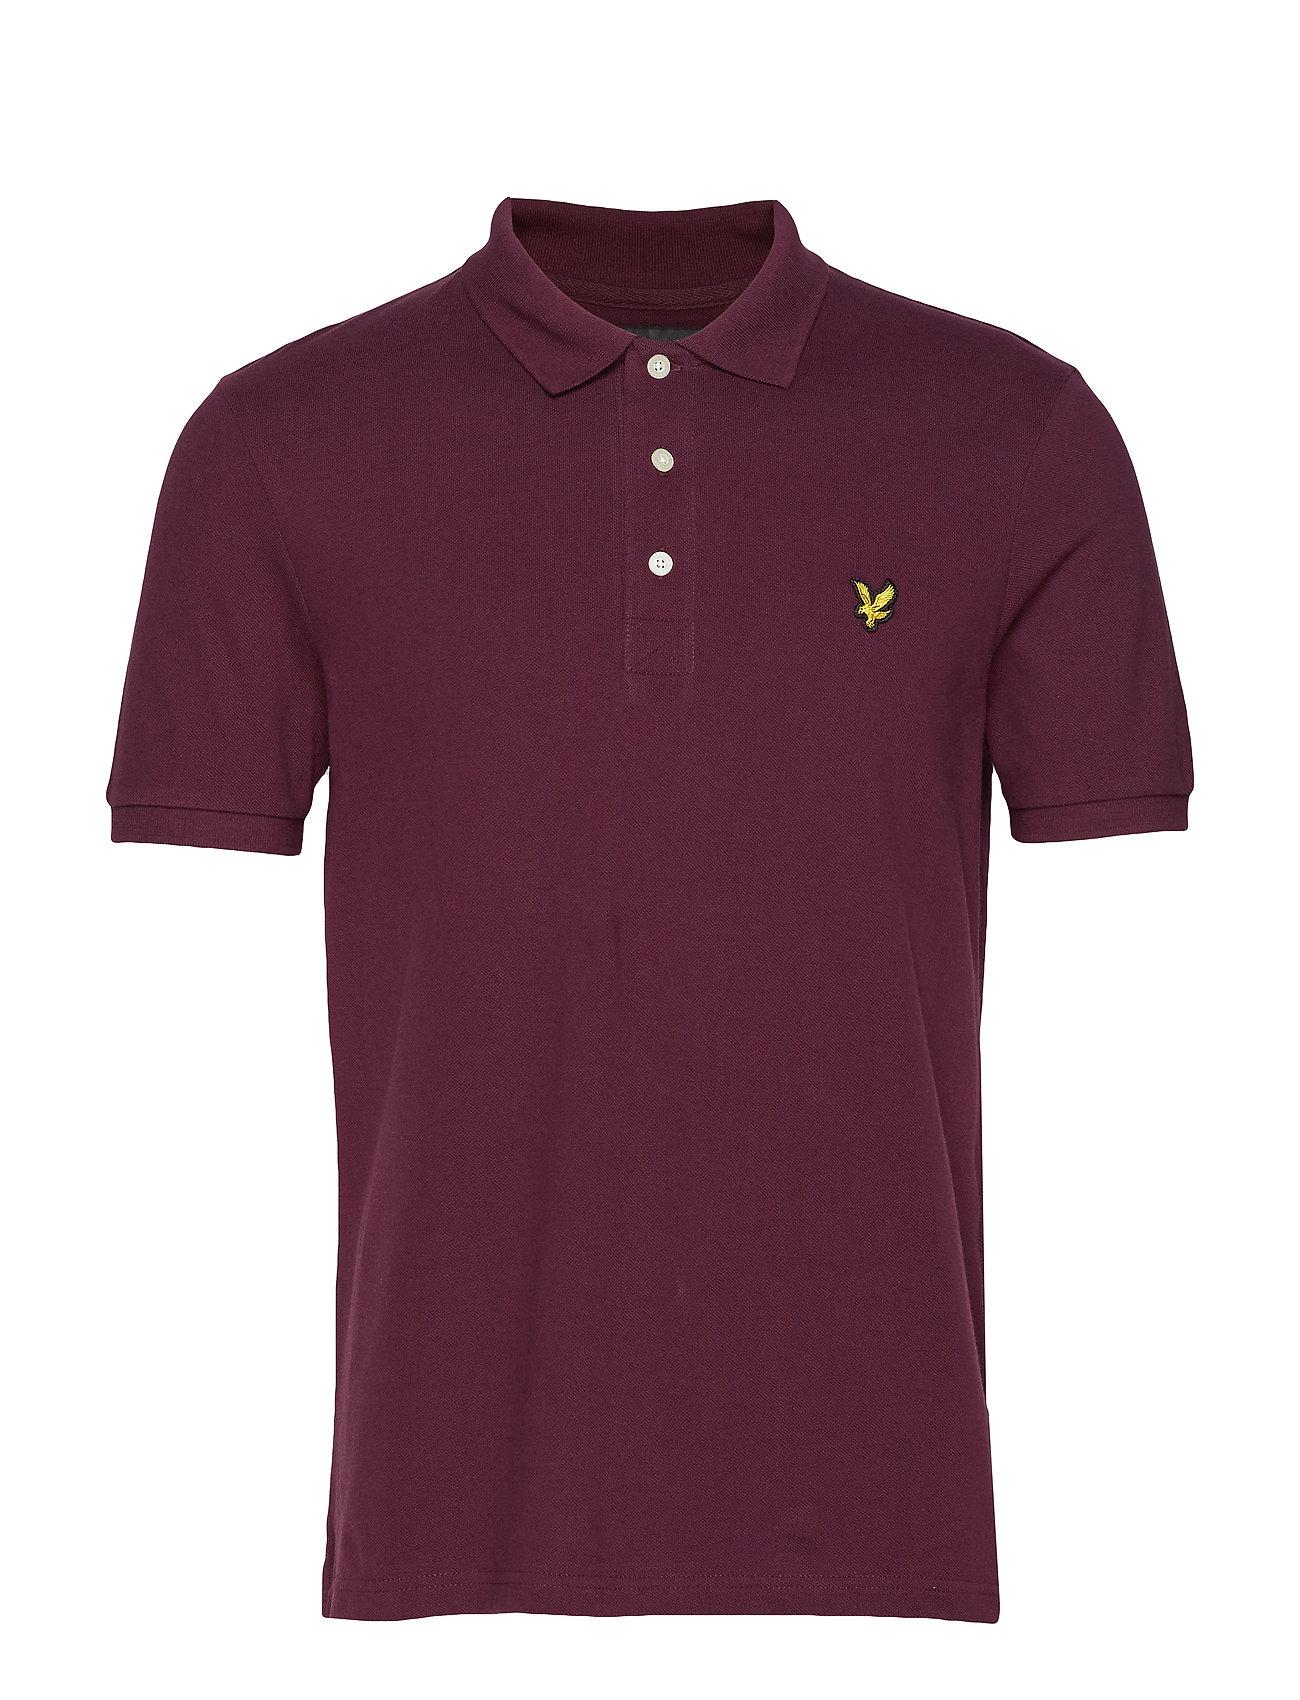 Lyle & Scott Polo Shirt - BURGUNDY